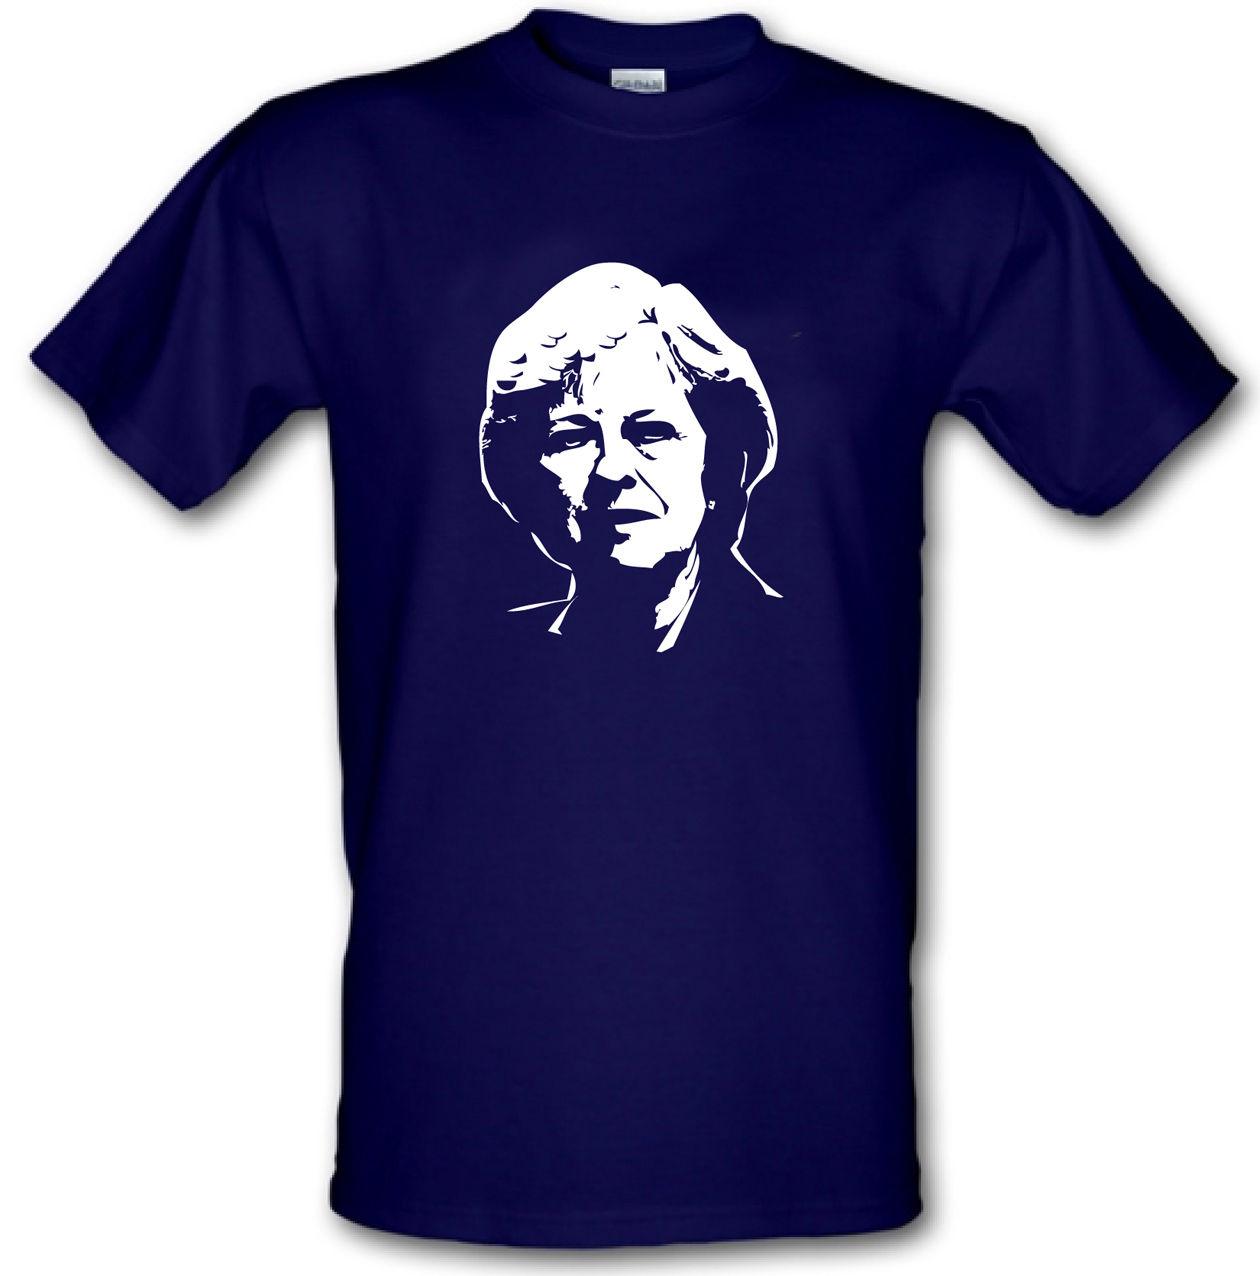 THERESA podrá TORY líder conservador elección Che Guevara camiseta tamaños S-XXL Harajuku Tops de moda clásico